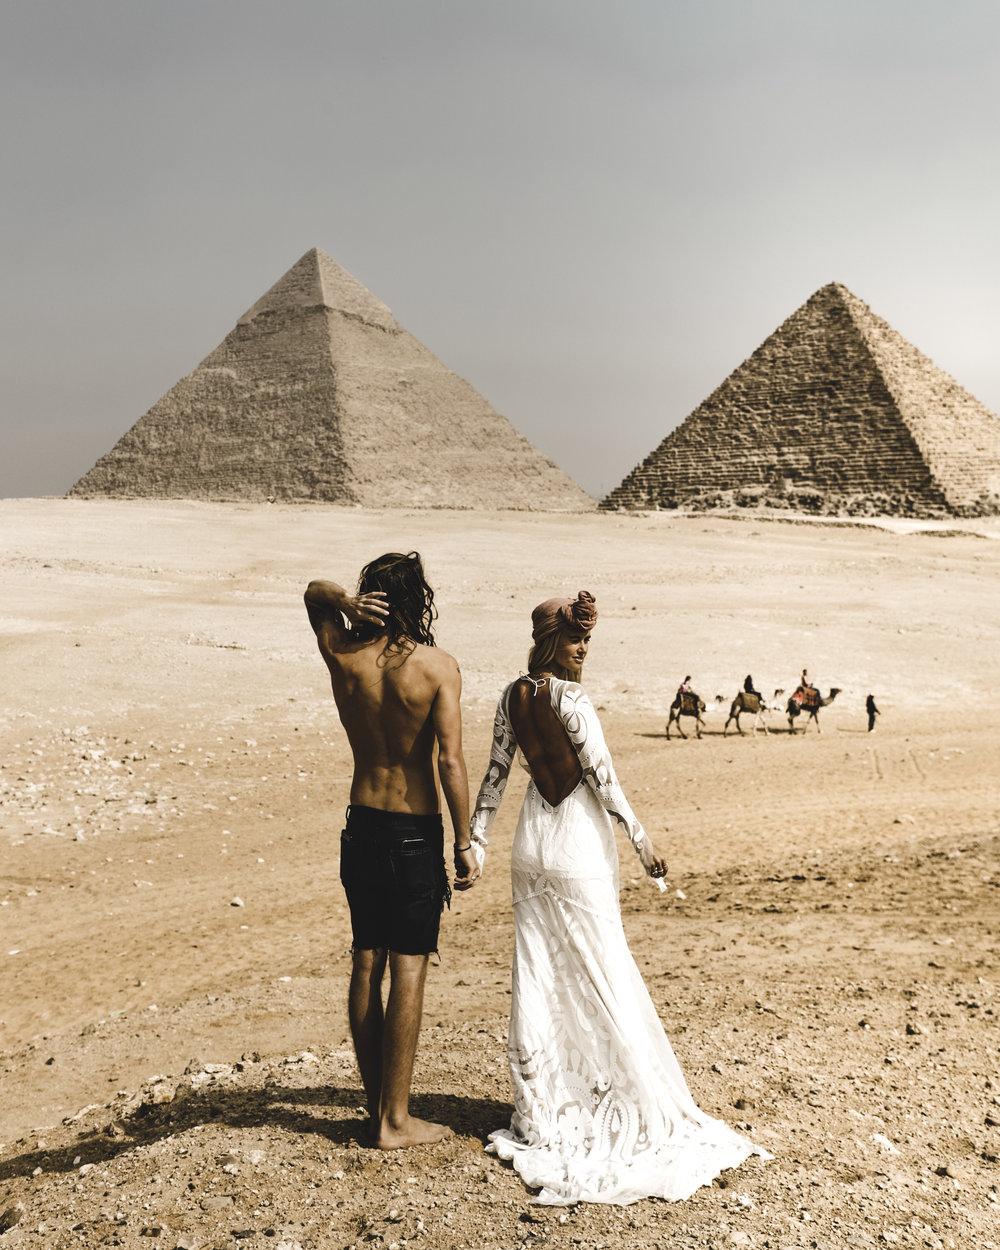 Giza Pyramids 1-1.jpg